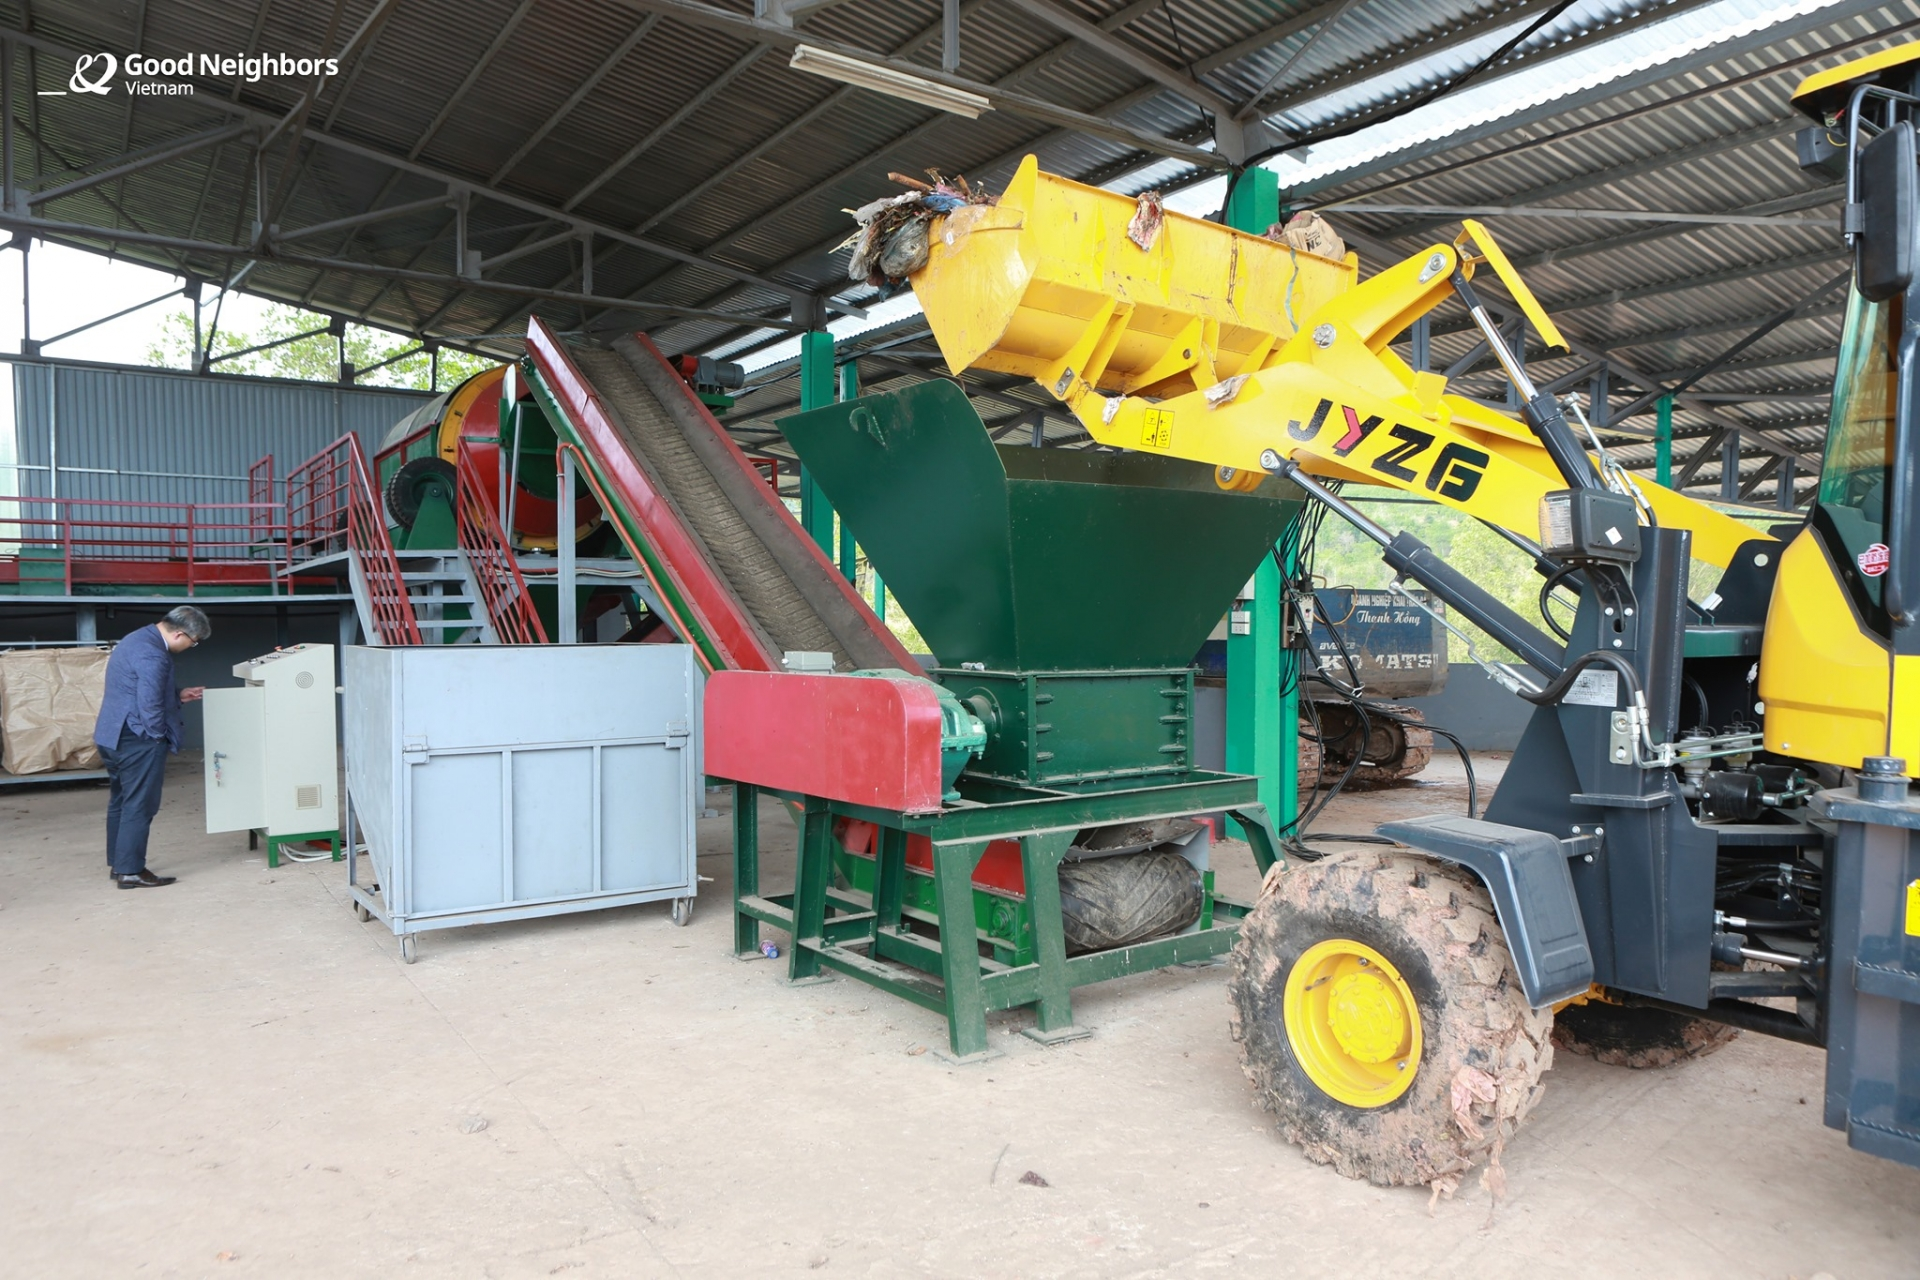 GNI hands over to Mai Chau (Hoa Binh province) waste treatment system